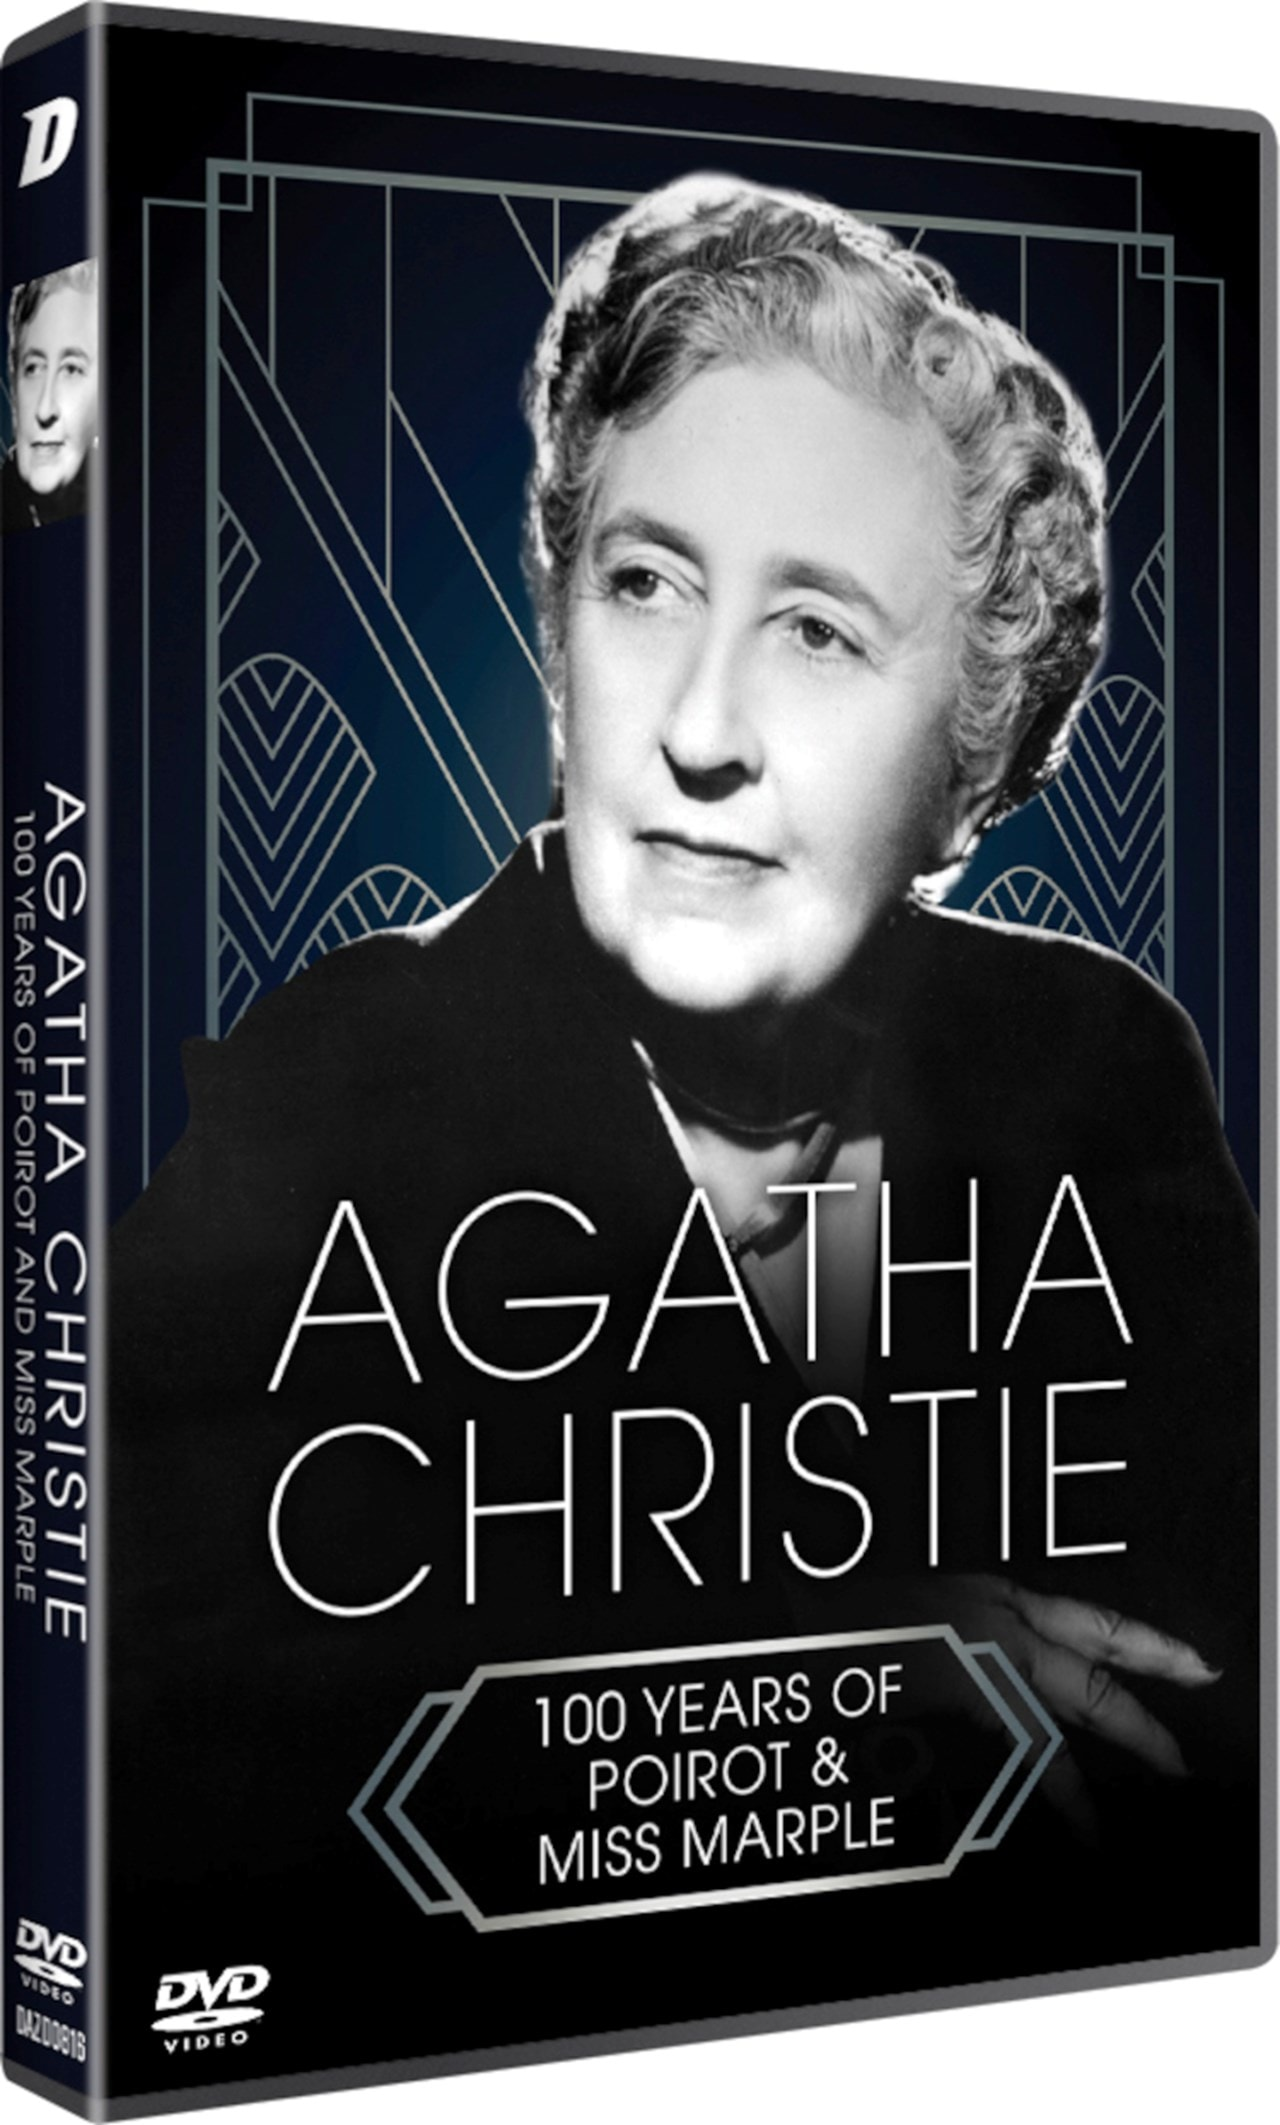 Agatha Christie: 100 Years of Poirot & Miss Marple - 2